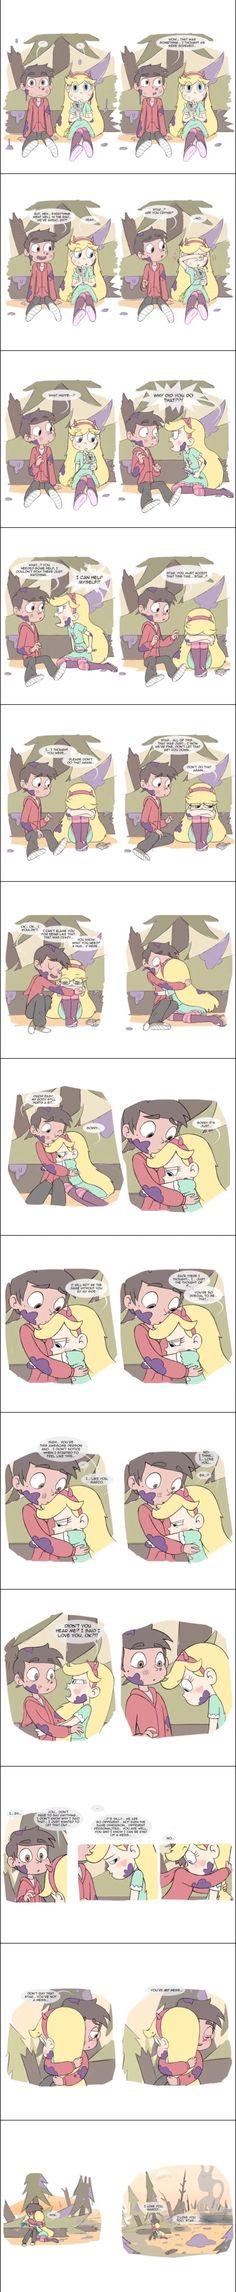 Starco comic